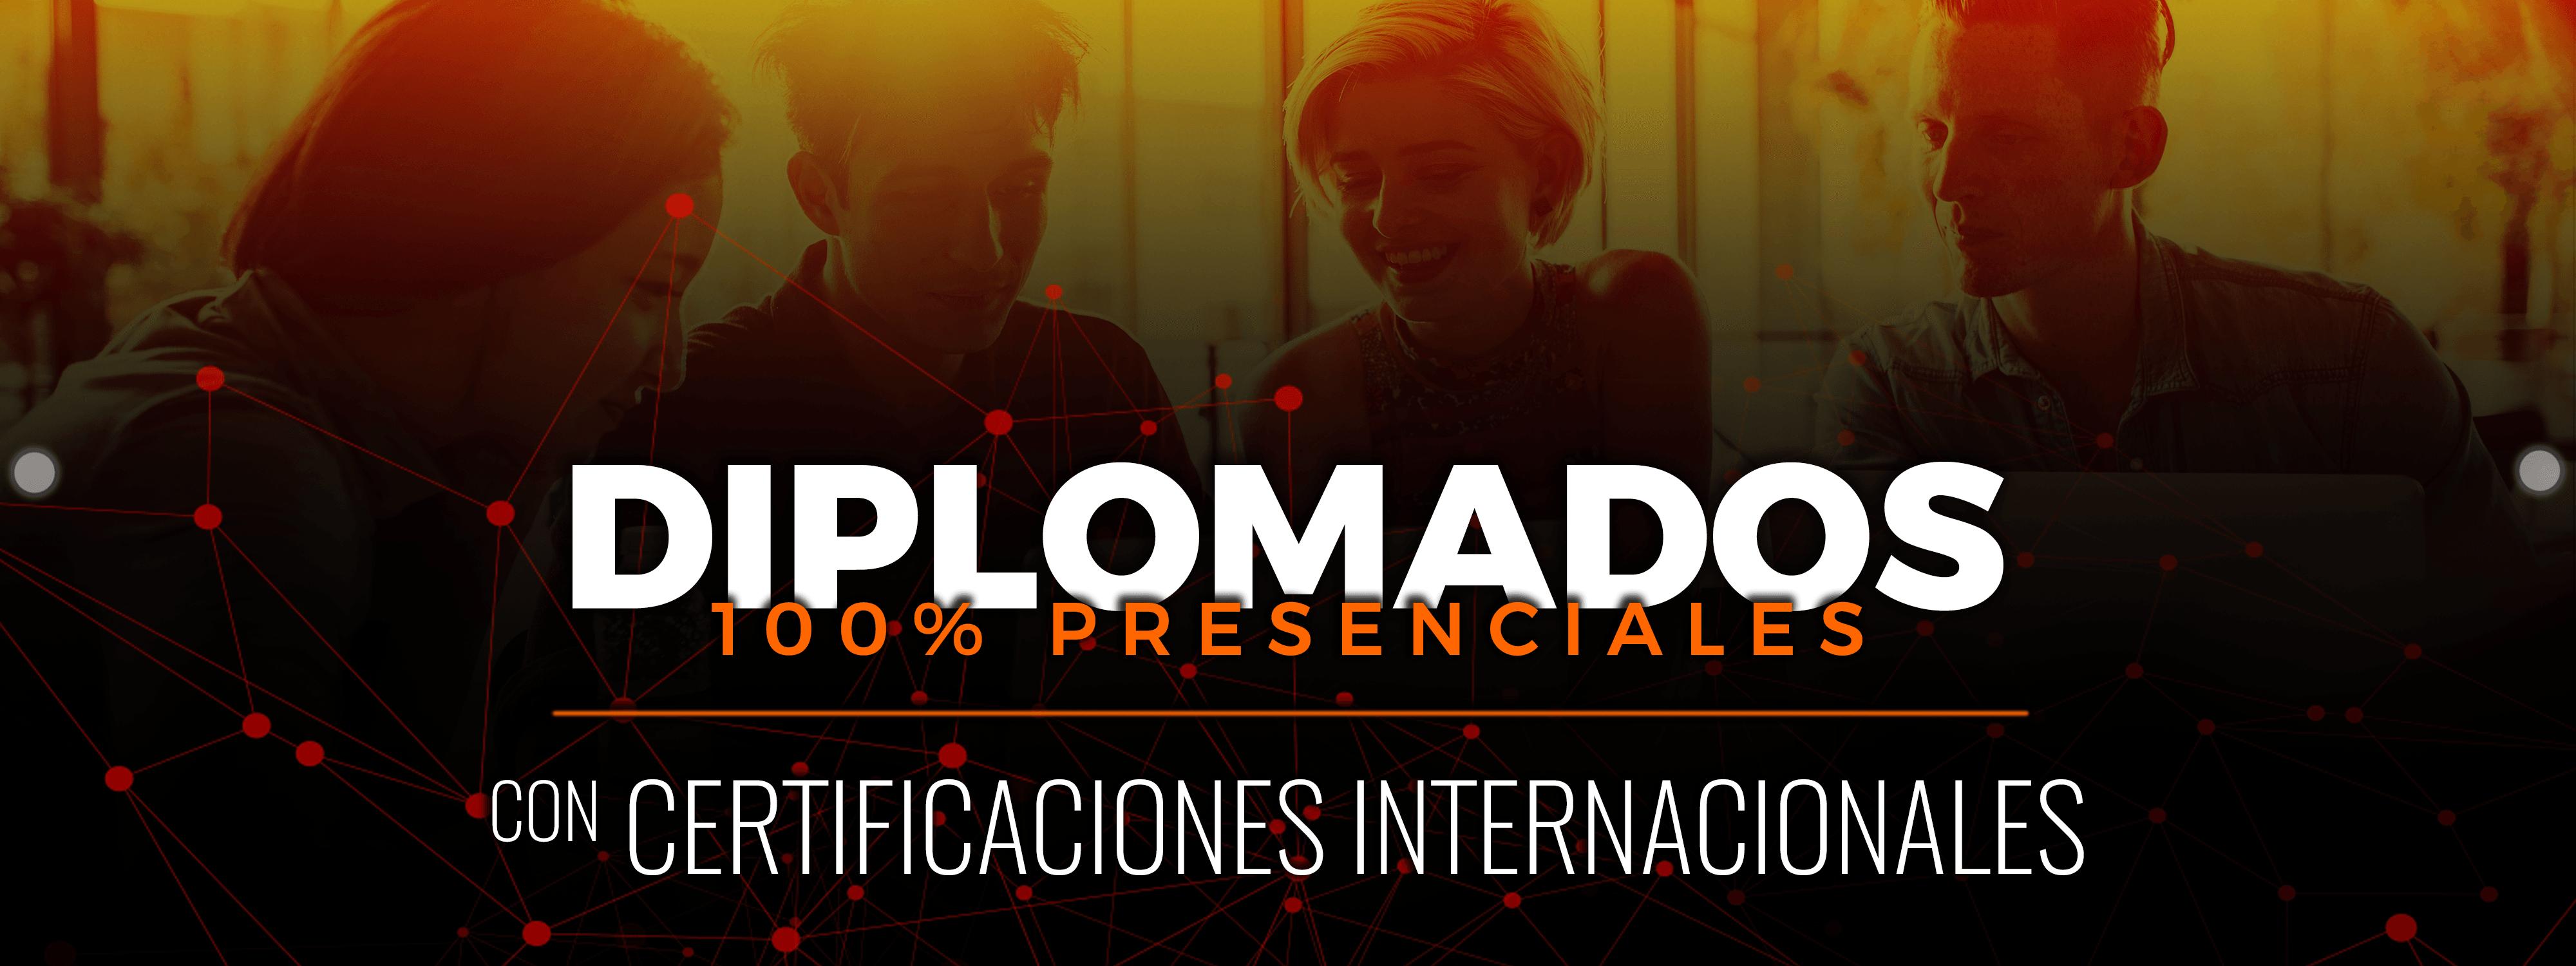 Diplomados Digital Business Academy